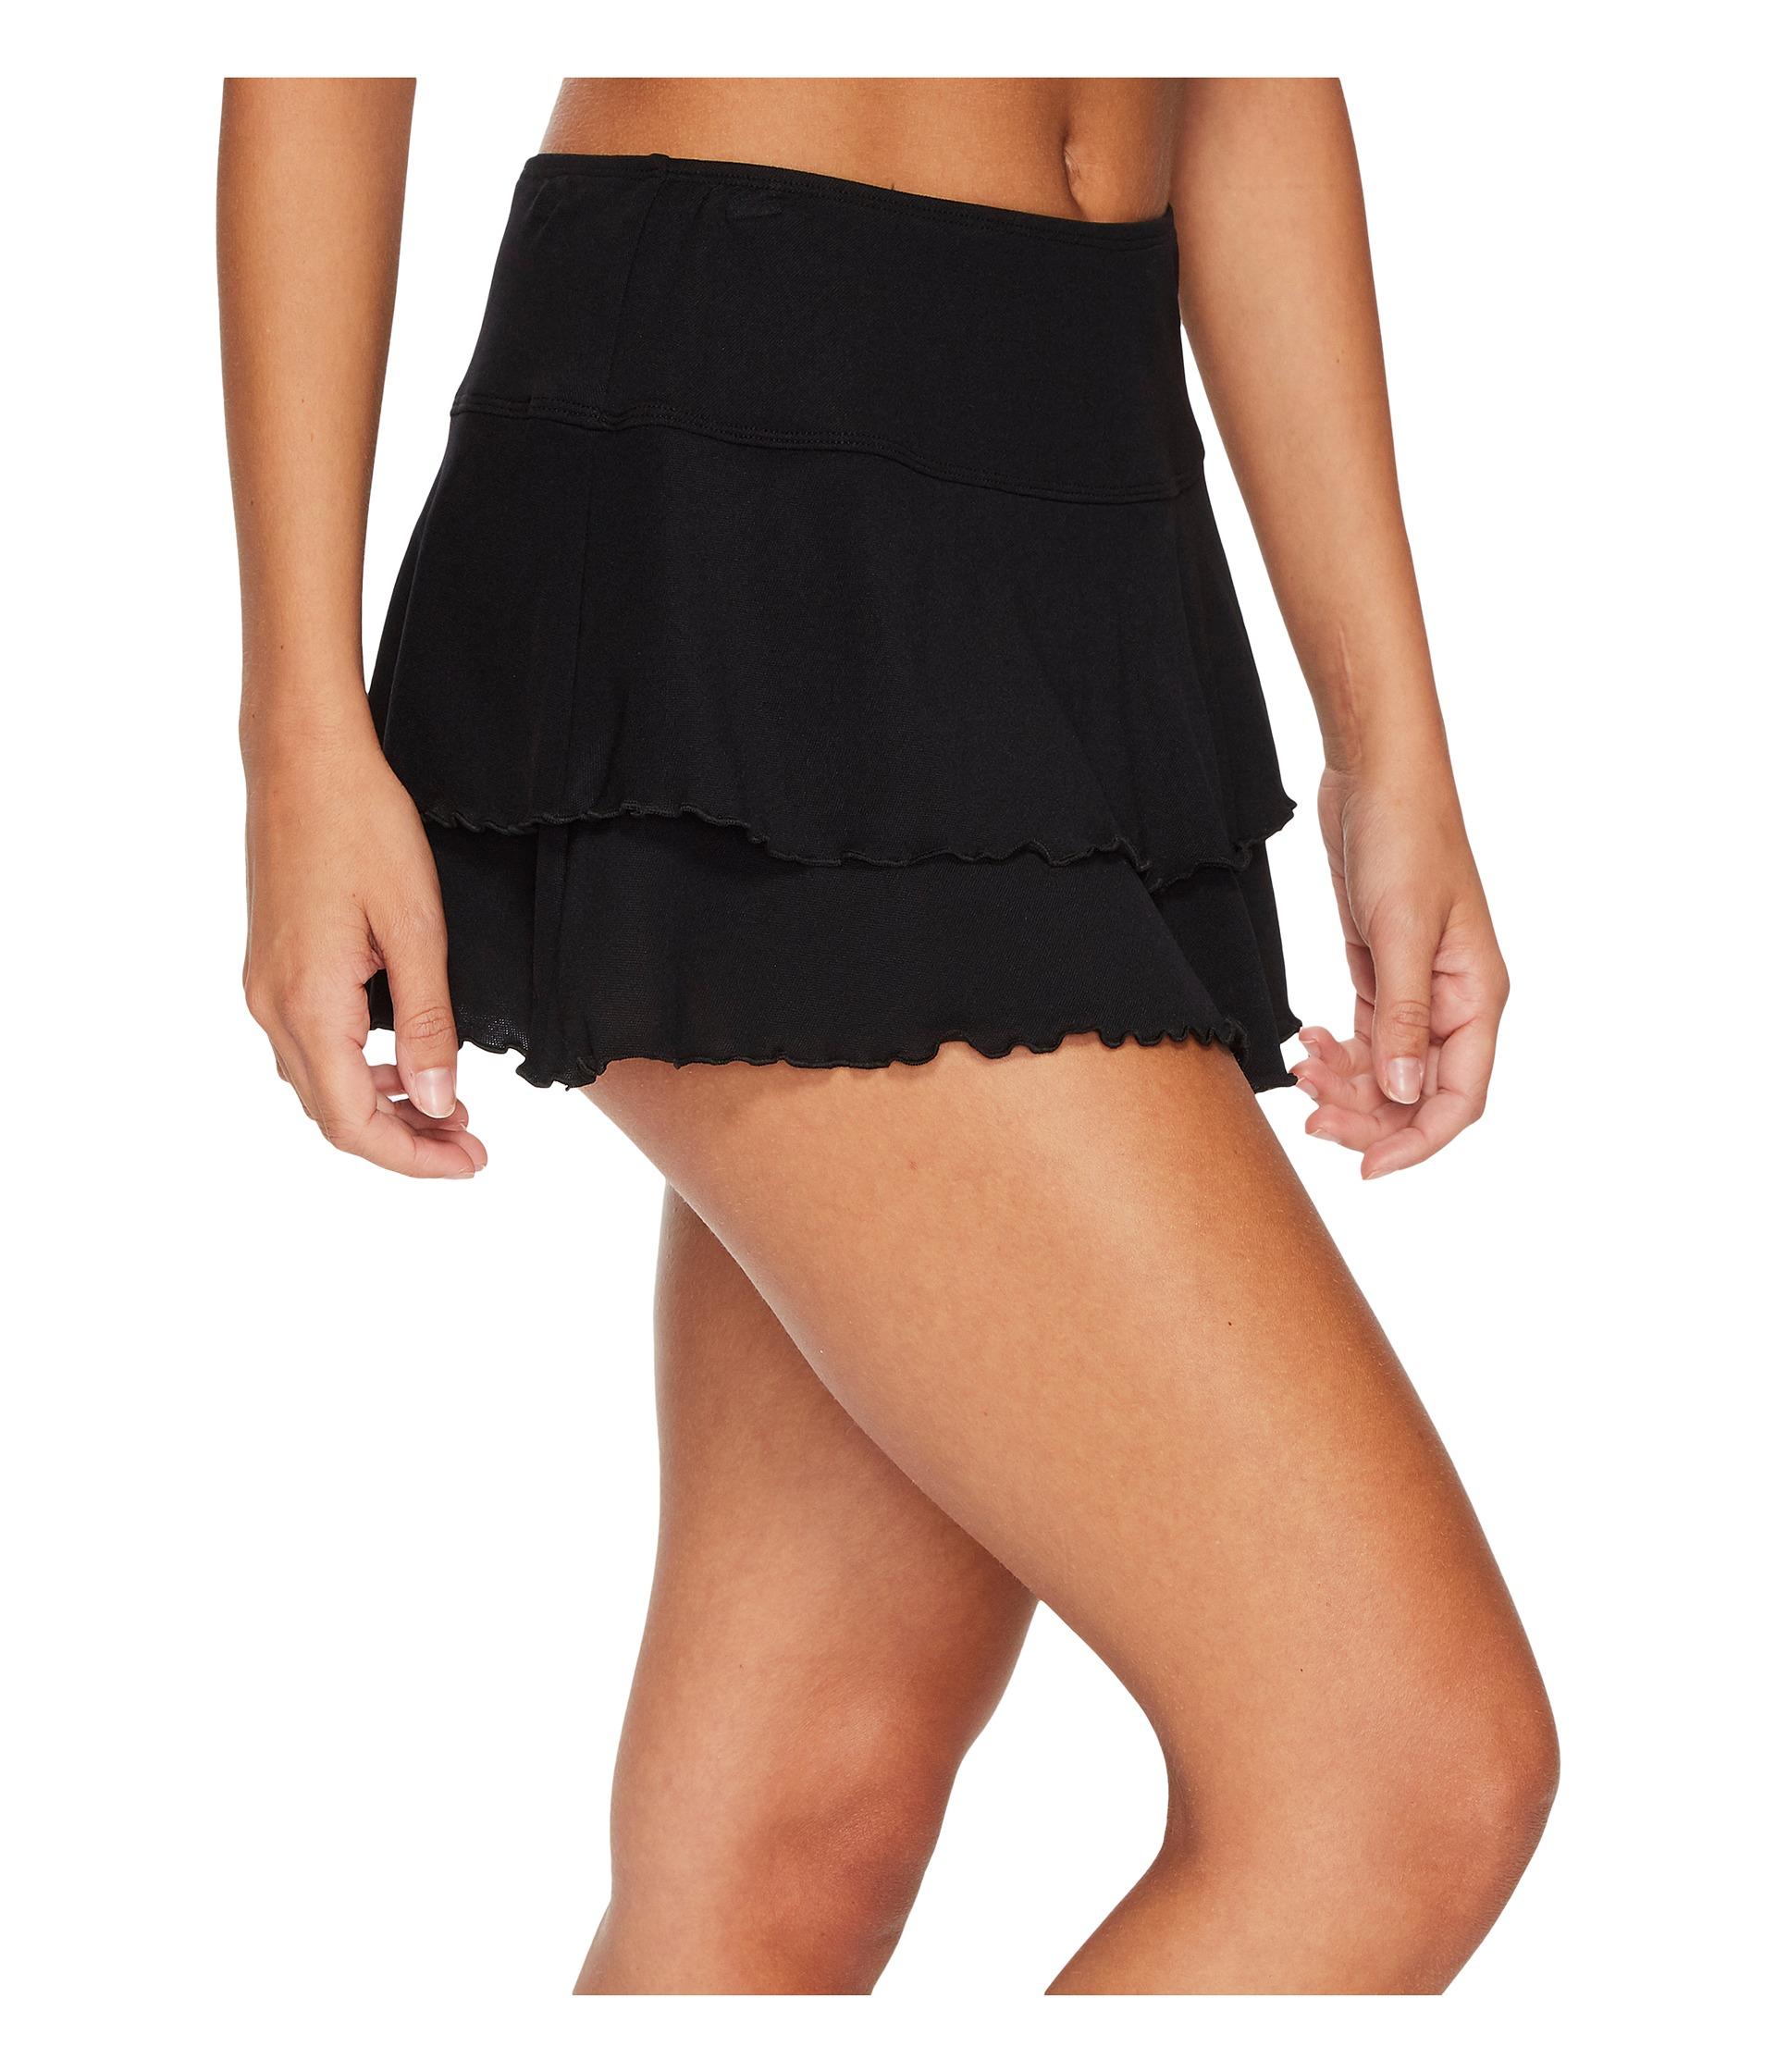 Body Glove Skirt 2